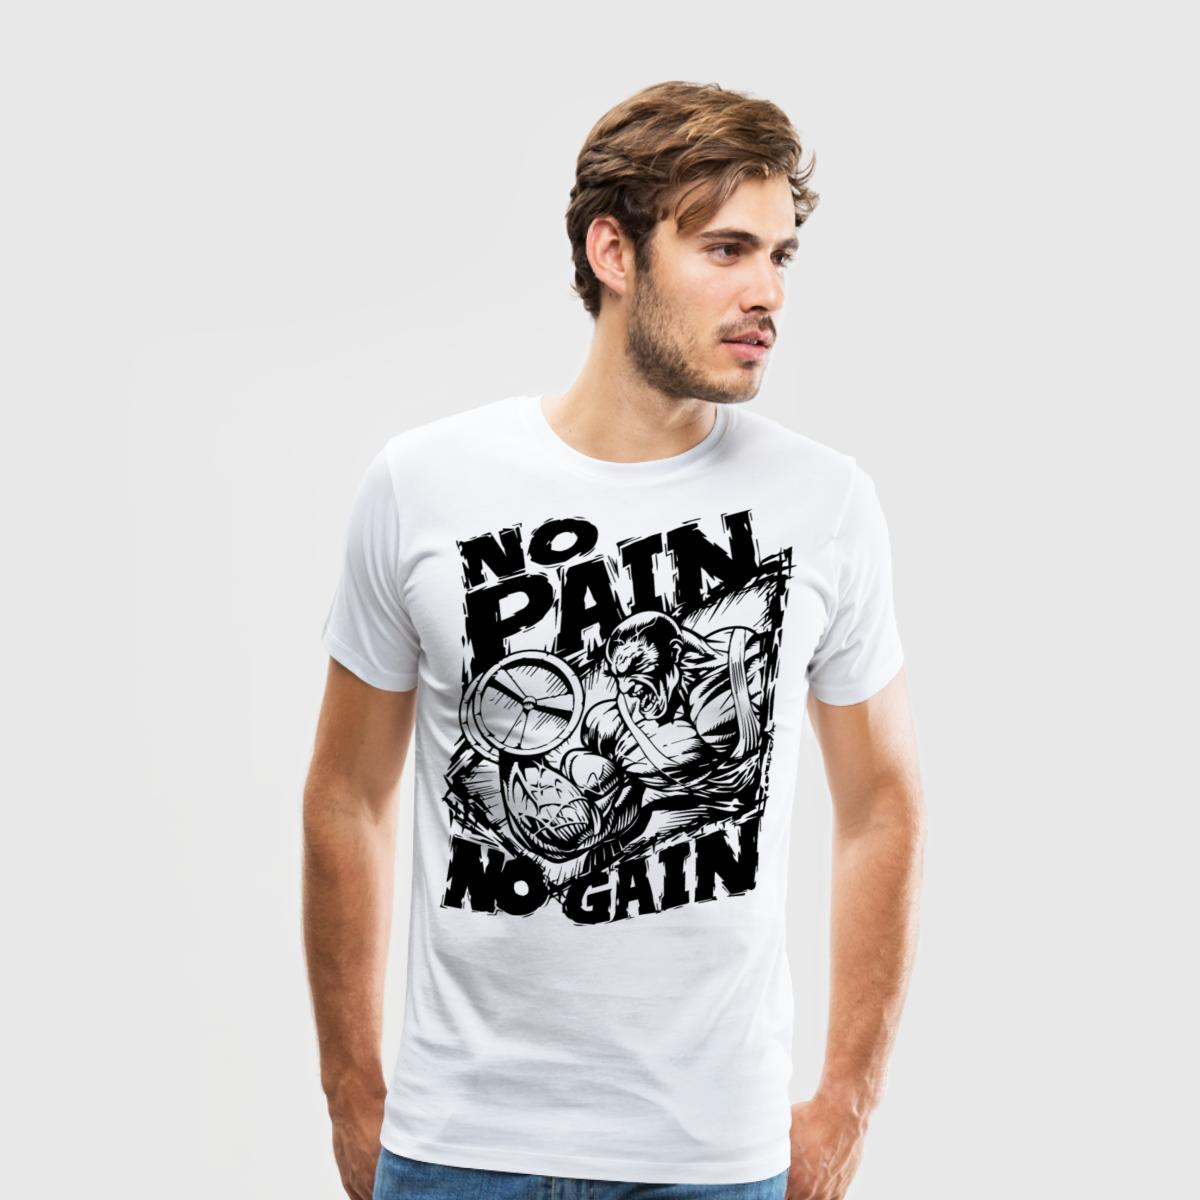 New Men's t shirts No Pain No Gain Funny O Neck Tees  T-shirts Mens fashion inspirational men t shirt